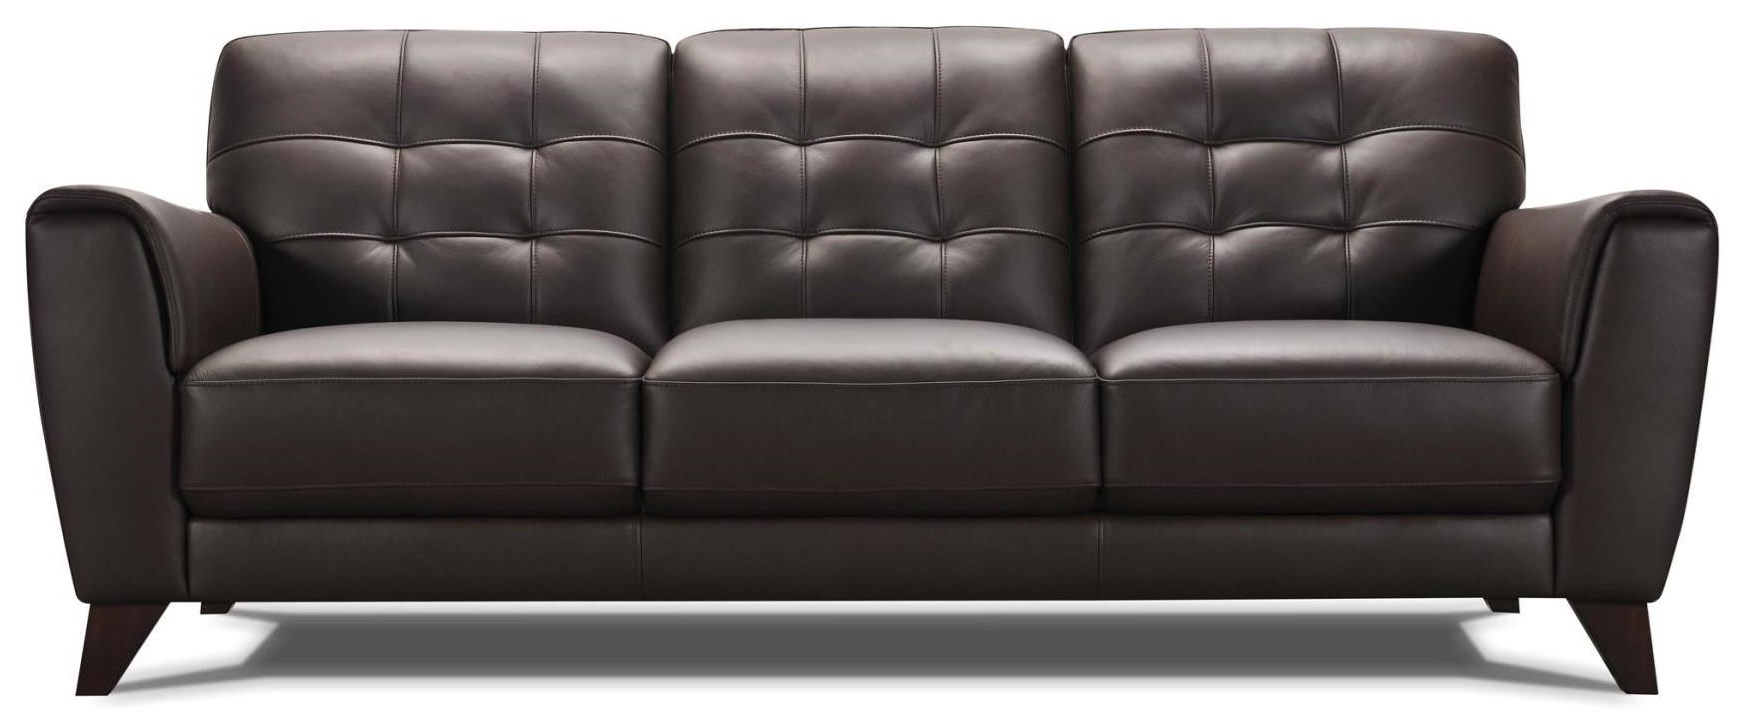 32294 Leather Sofa - Brown by Violino at Furniture Fair - North Carolina